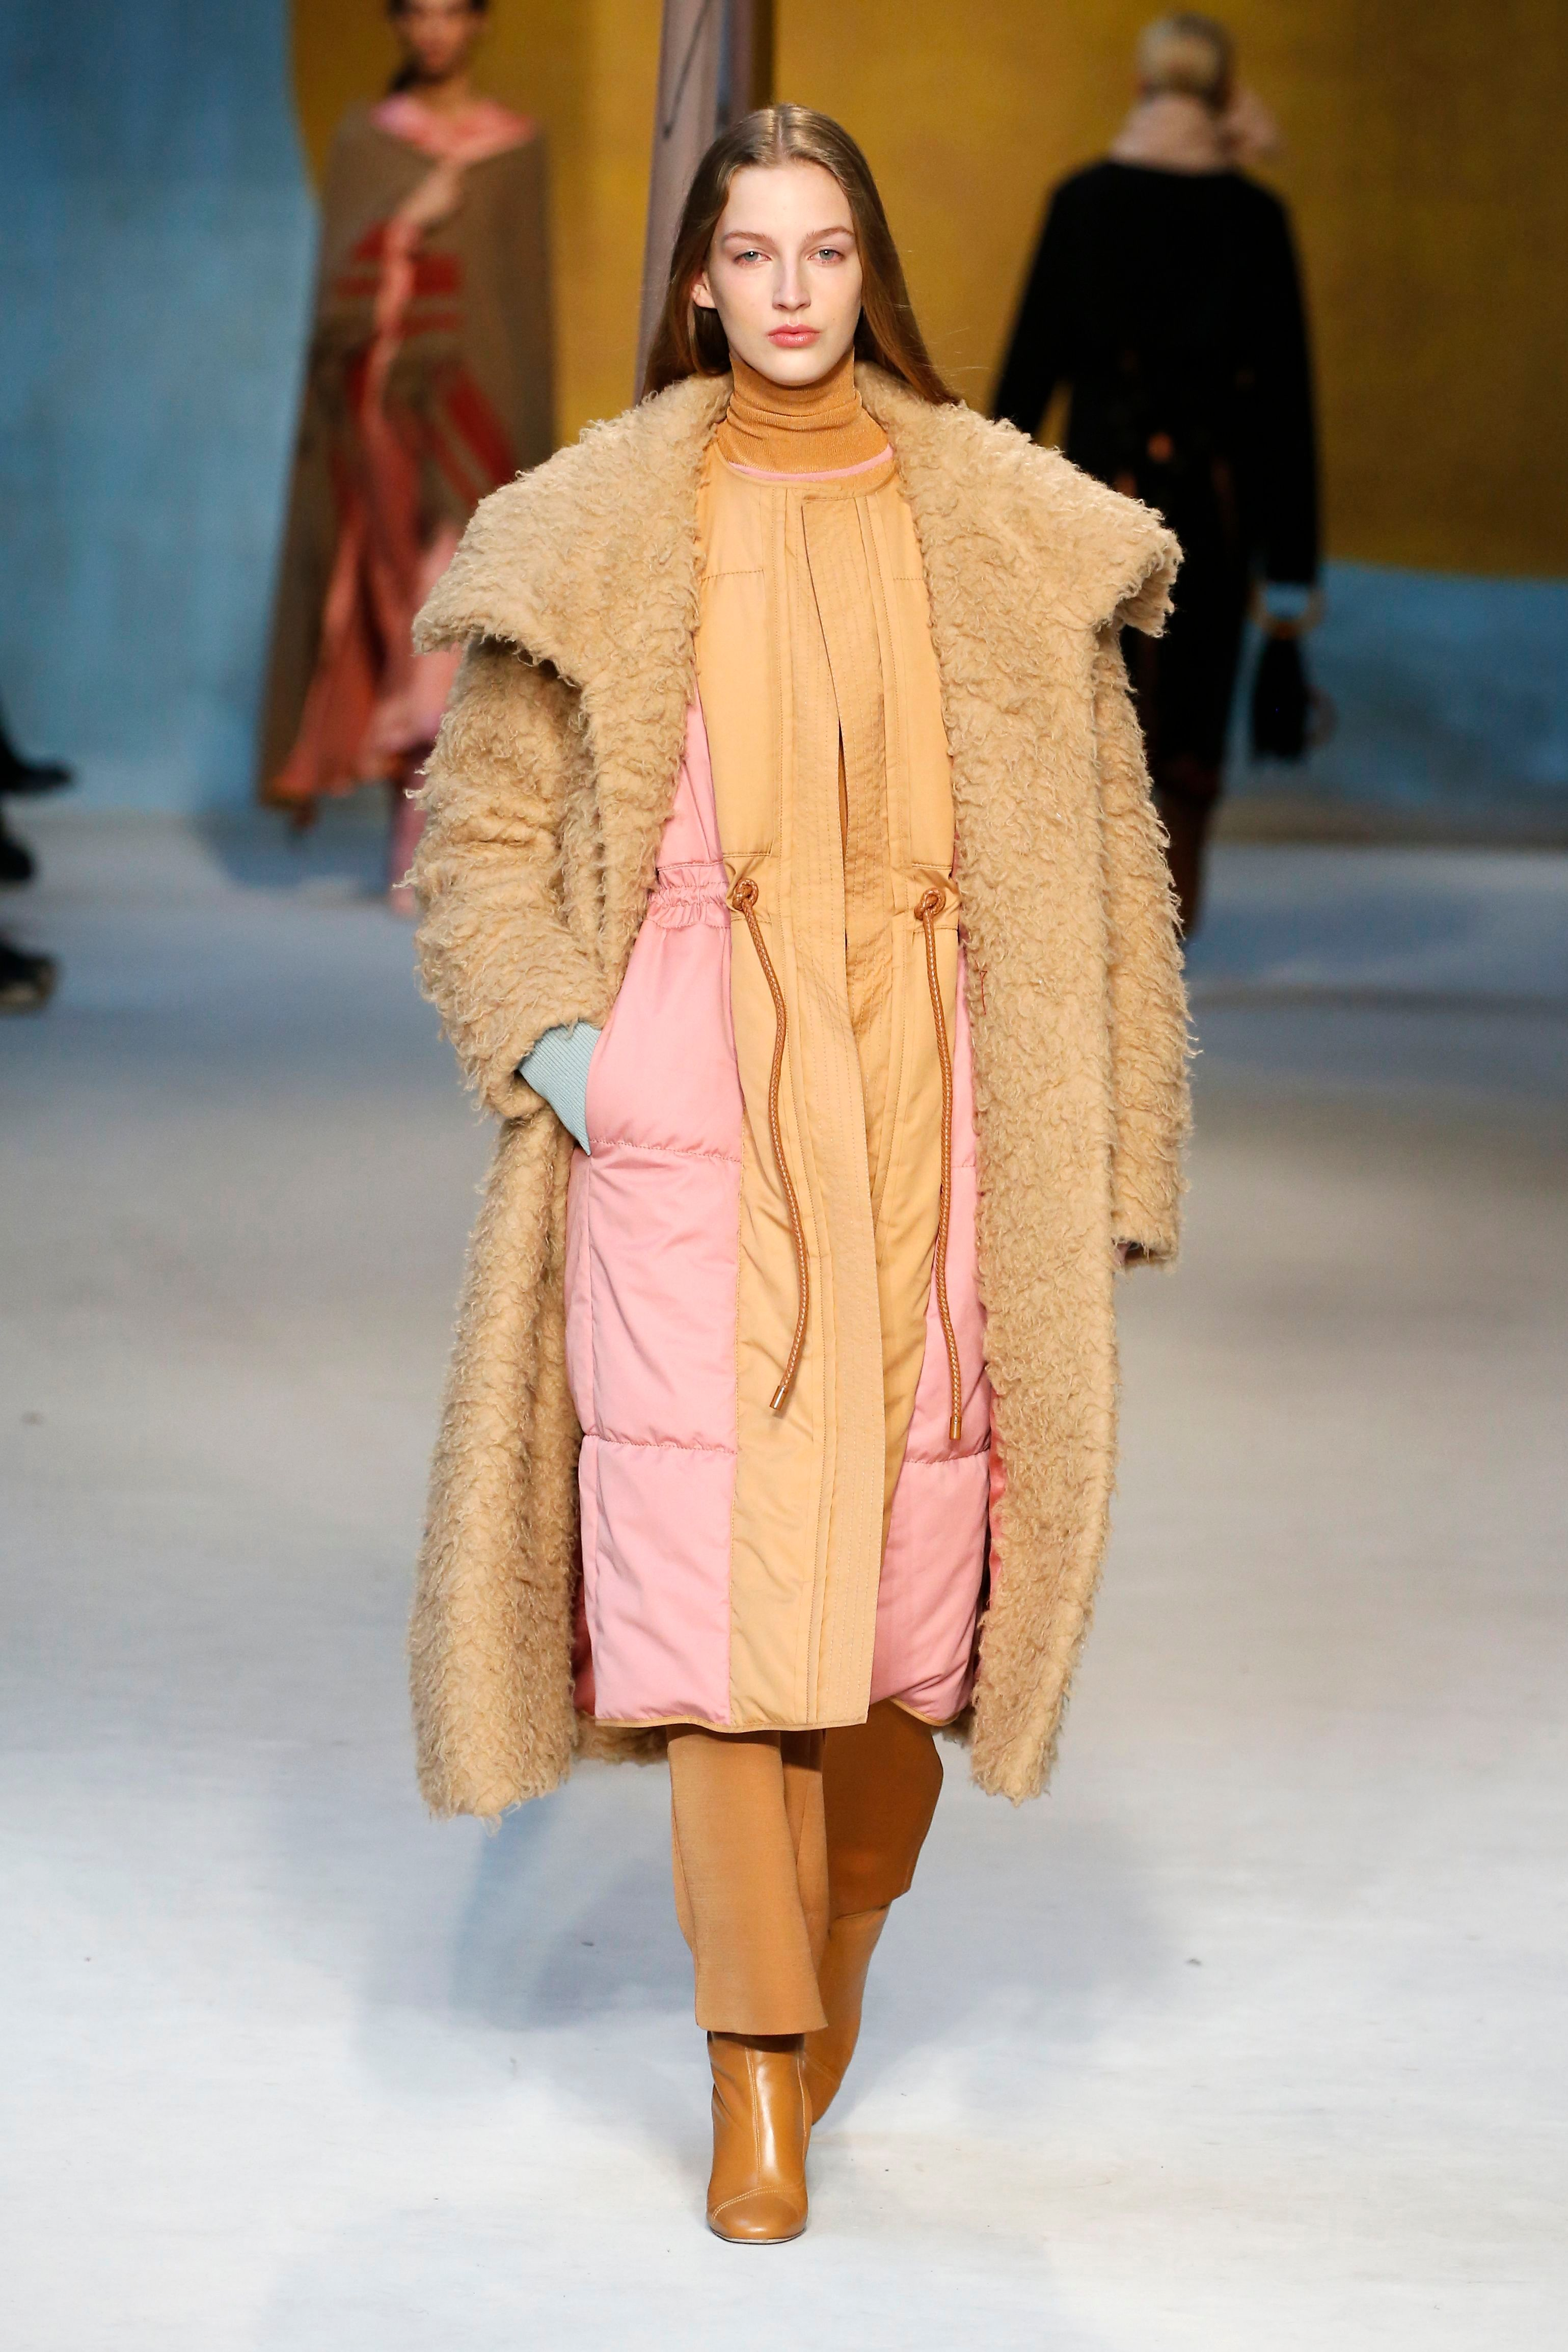 Model on the catwalkRoksanda show, Runway, Fall Winter 2018, London Fashion Week, UK - 19 Feb 2018